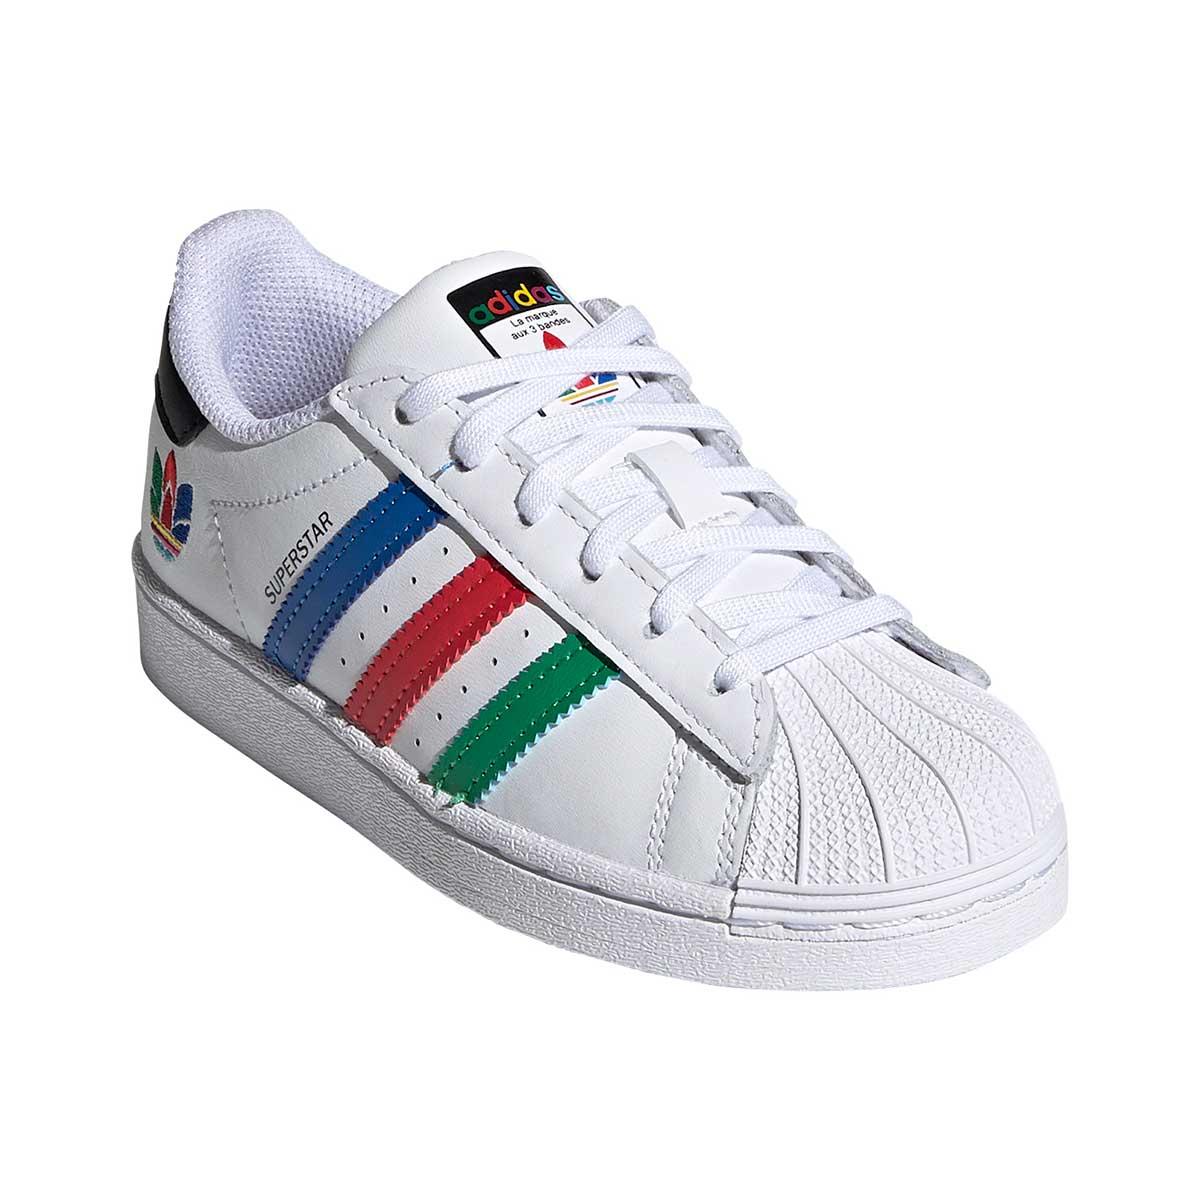 Tenis-Infantil-Adidas-Superstar-J--26-ao-32--FW5238--4Q20-